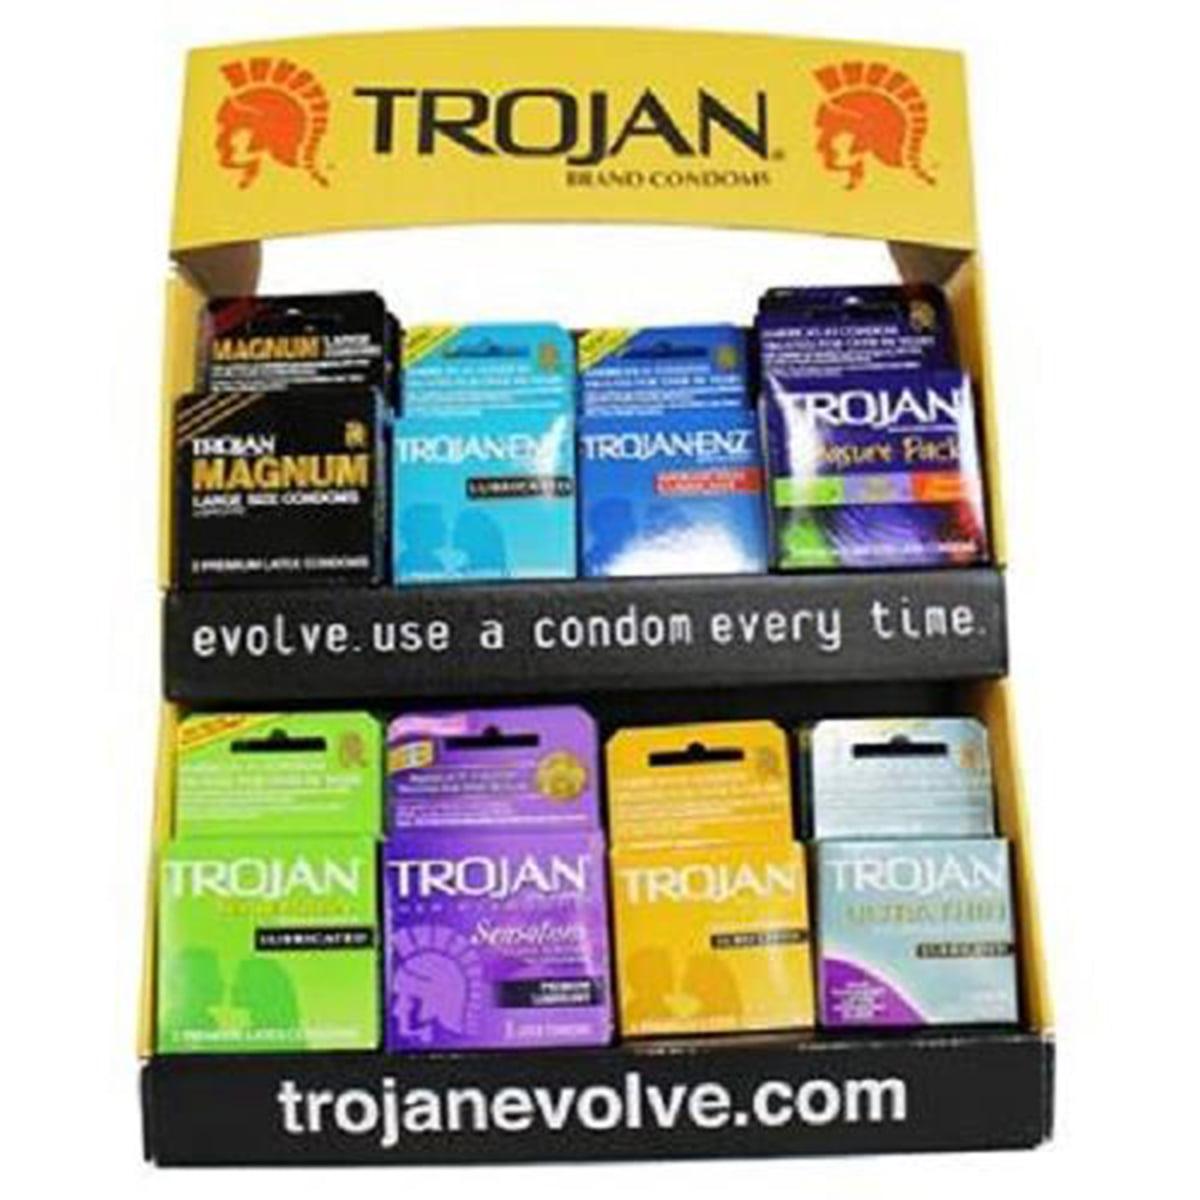 Product Of Trojan, Magnum Condoms - Jar, Count 48 - Birth Control / Grab Varieties & Flavors